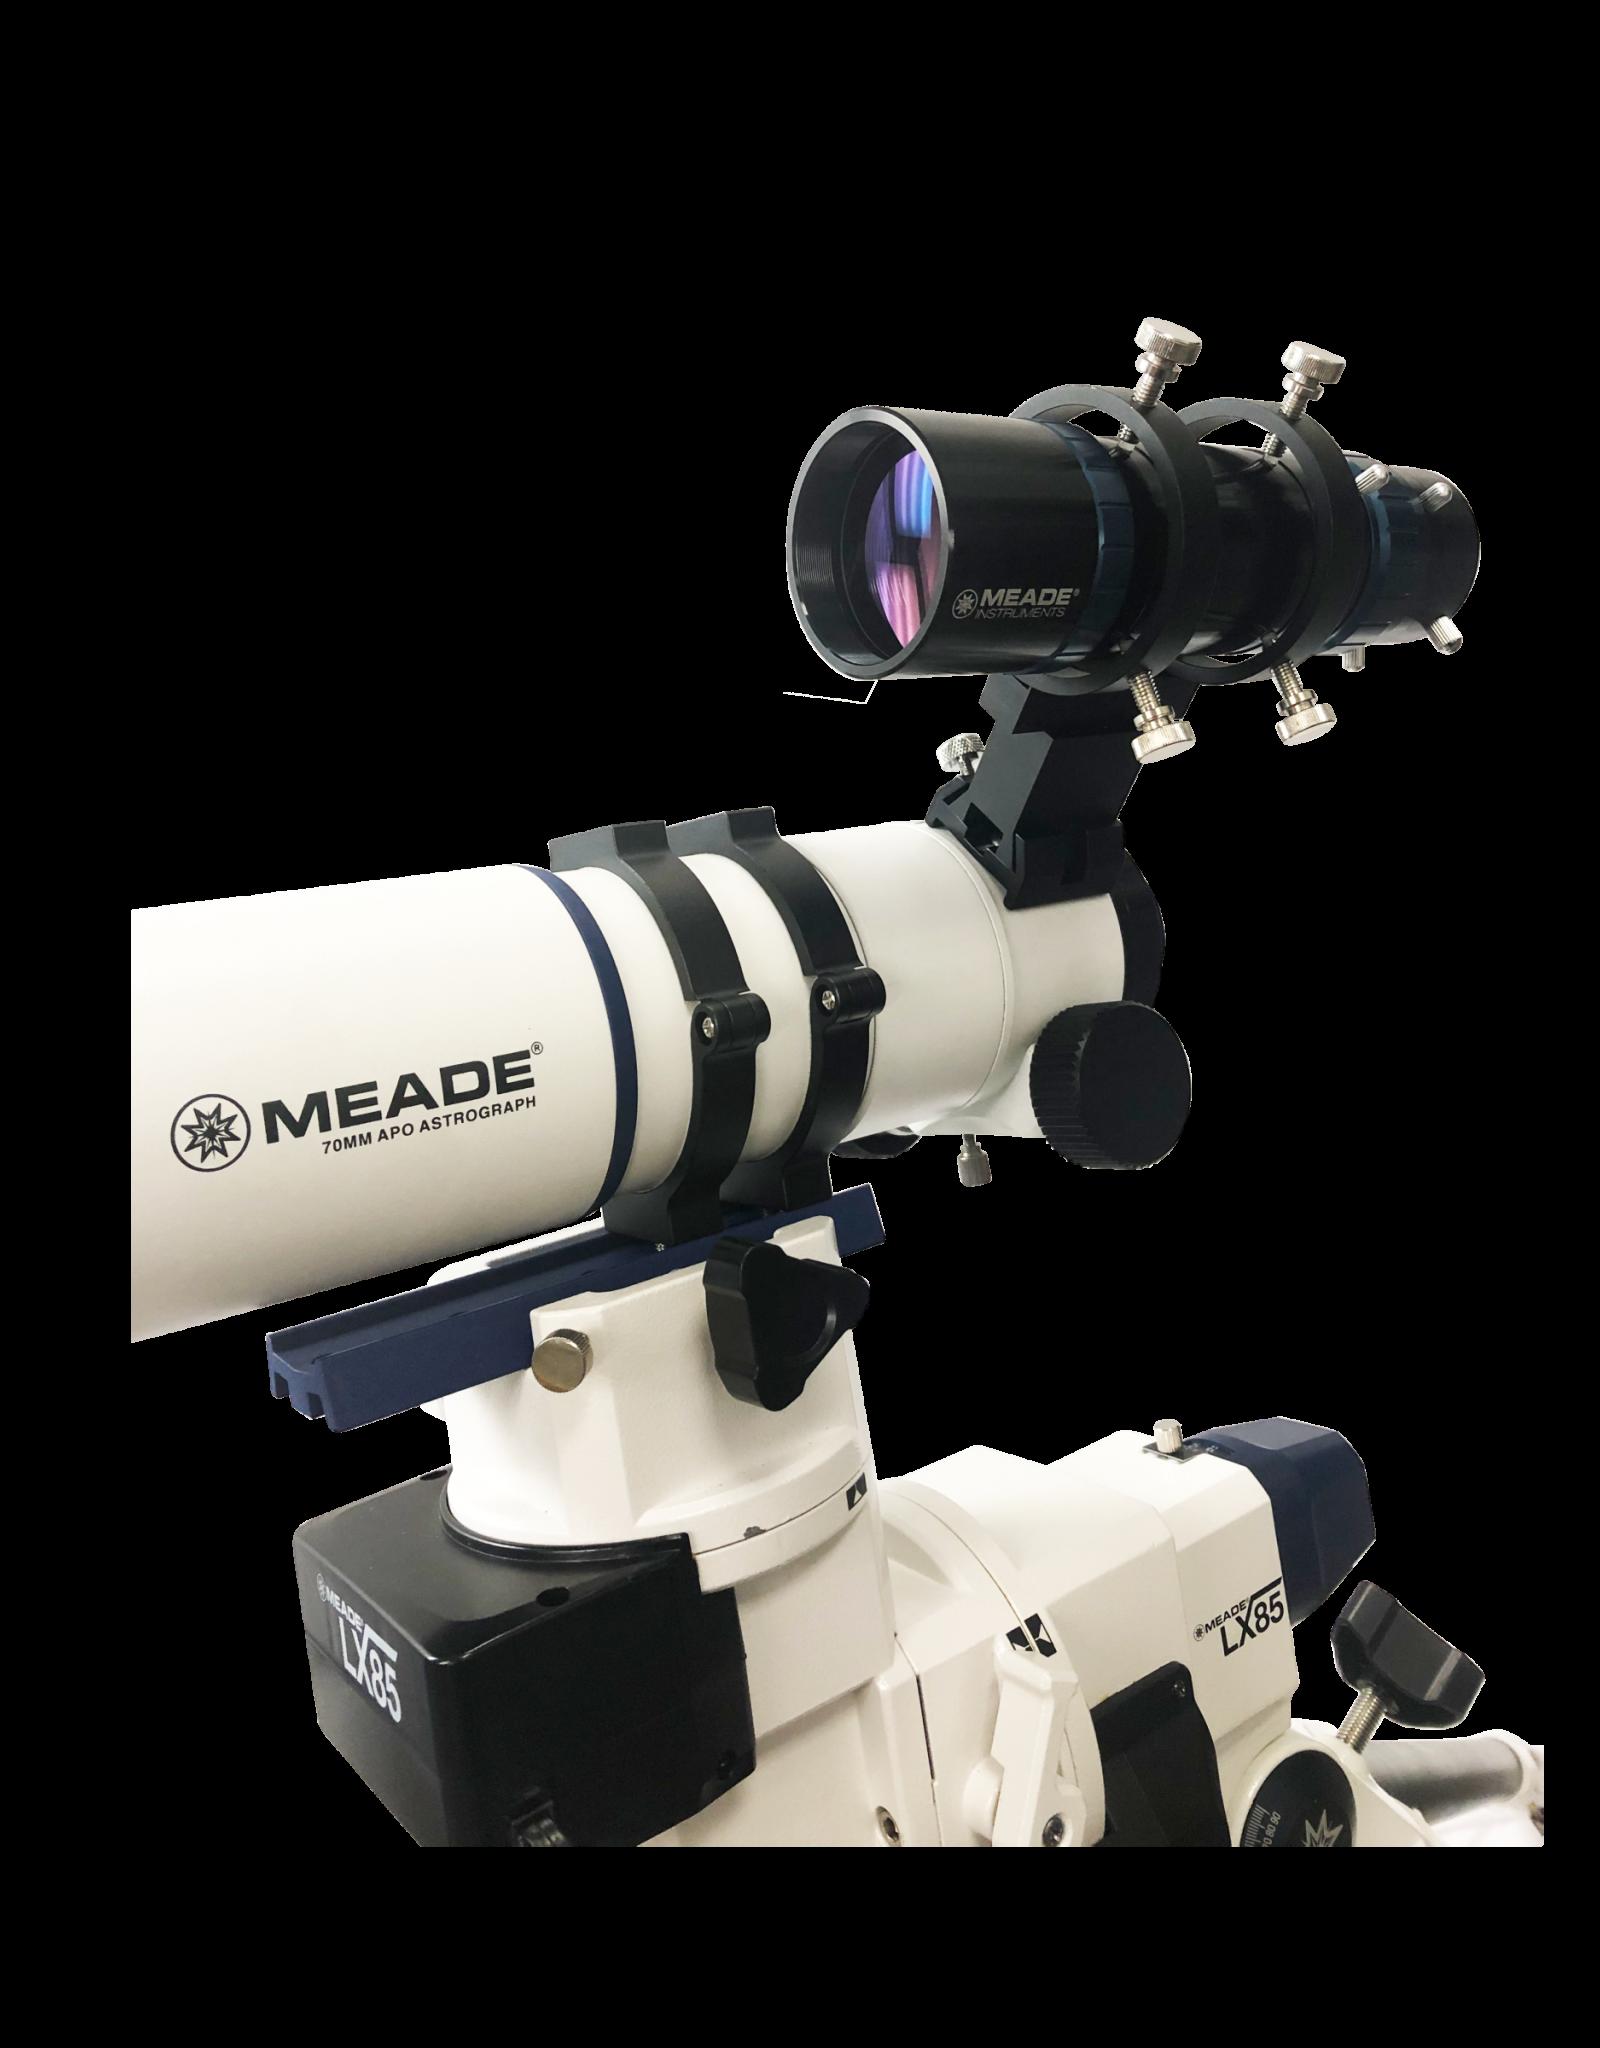 Meade Meade Series 6000 50mm Guide Scope